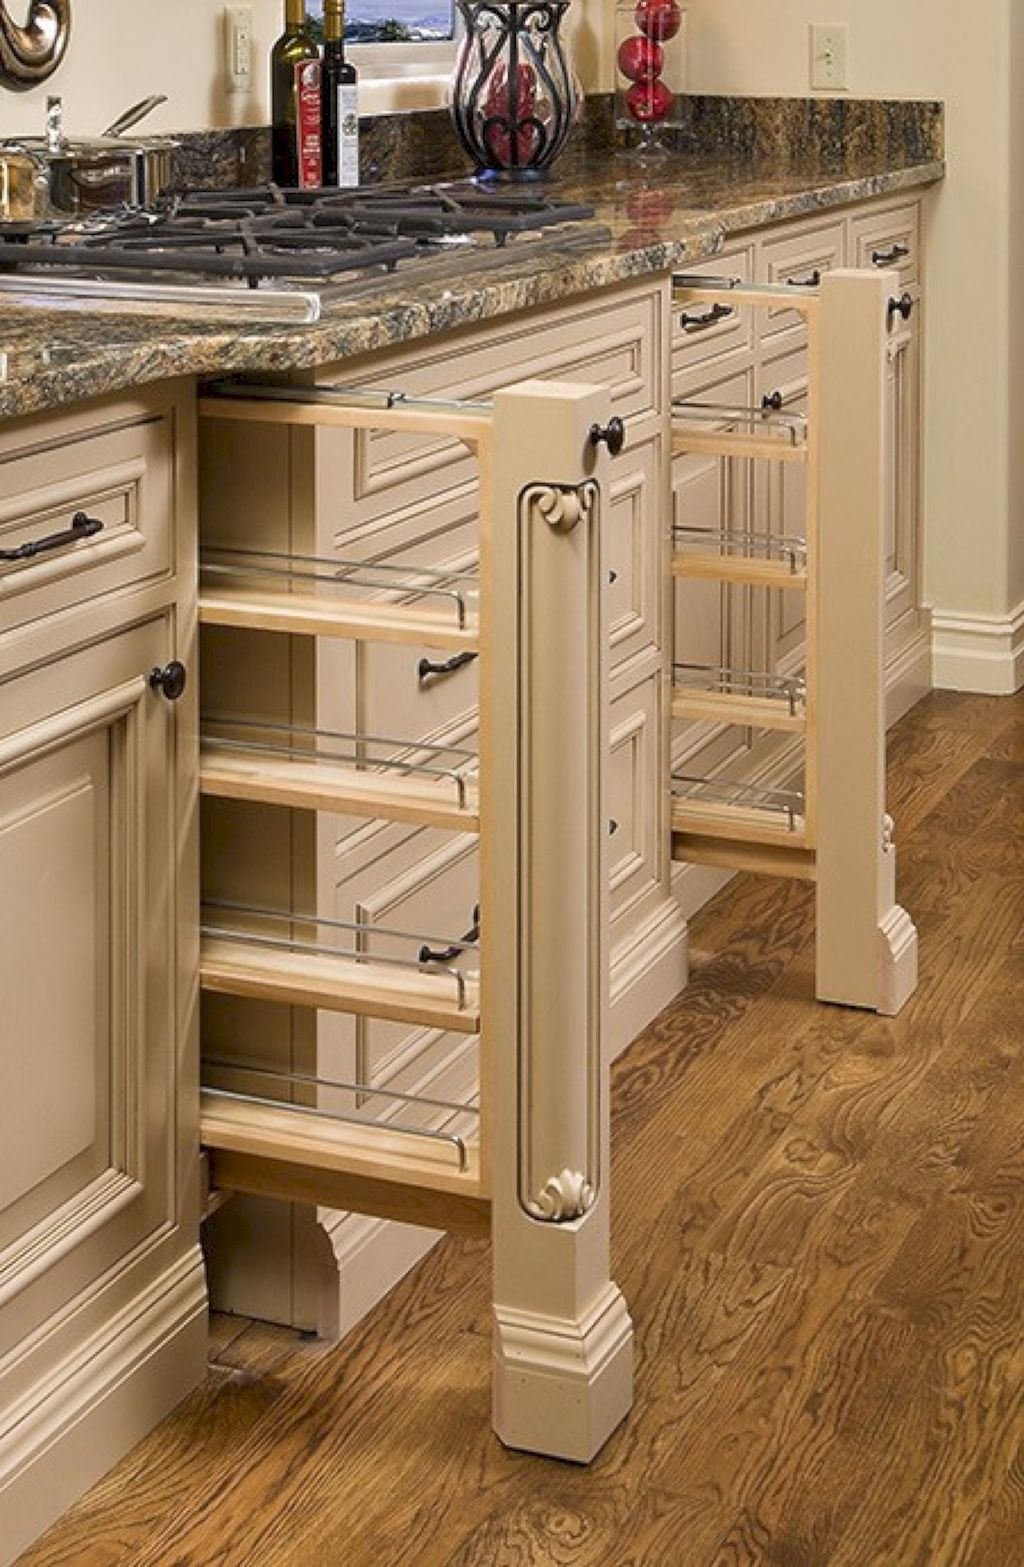 22 Smart Kitchen Cabinet Organization Ideas | Custom ...